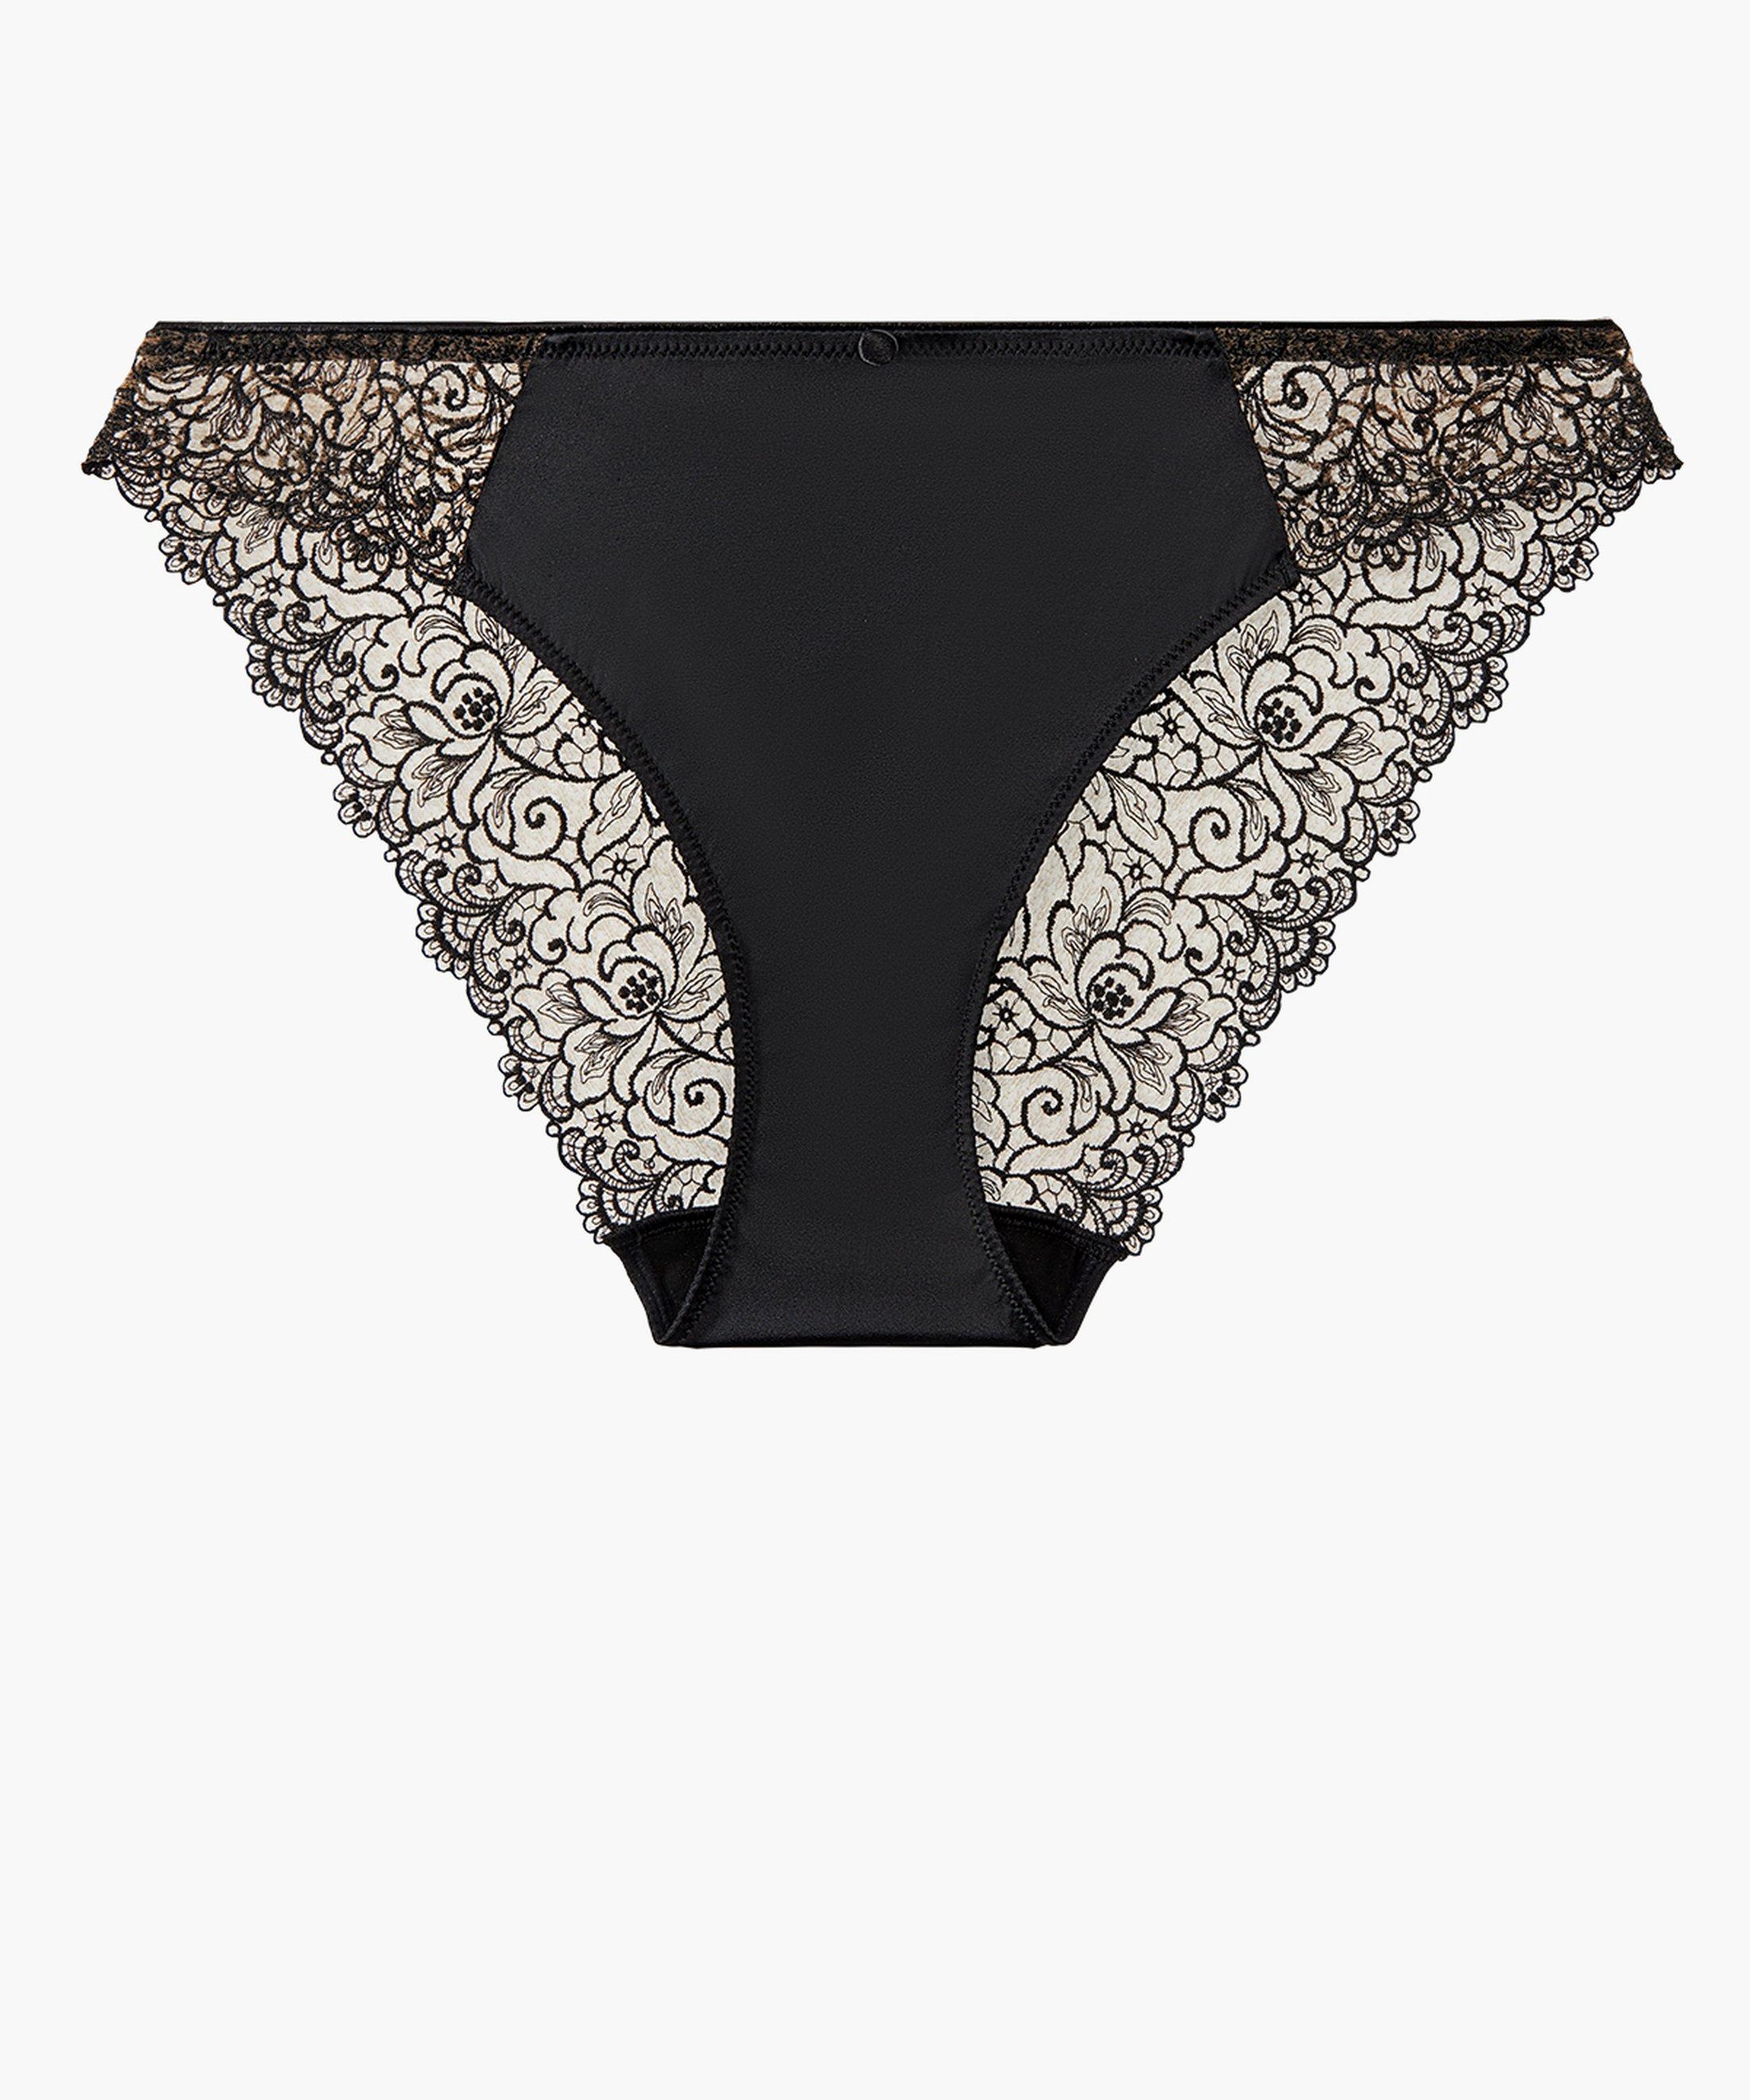 KARL LAGERFELD X AUBADE Culotte Italienne Noir Tuxedo | Aubade